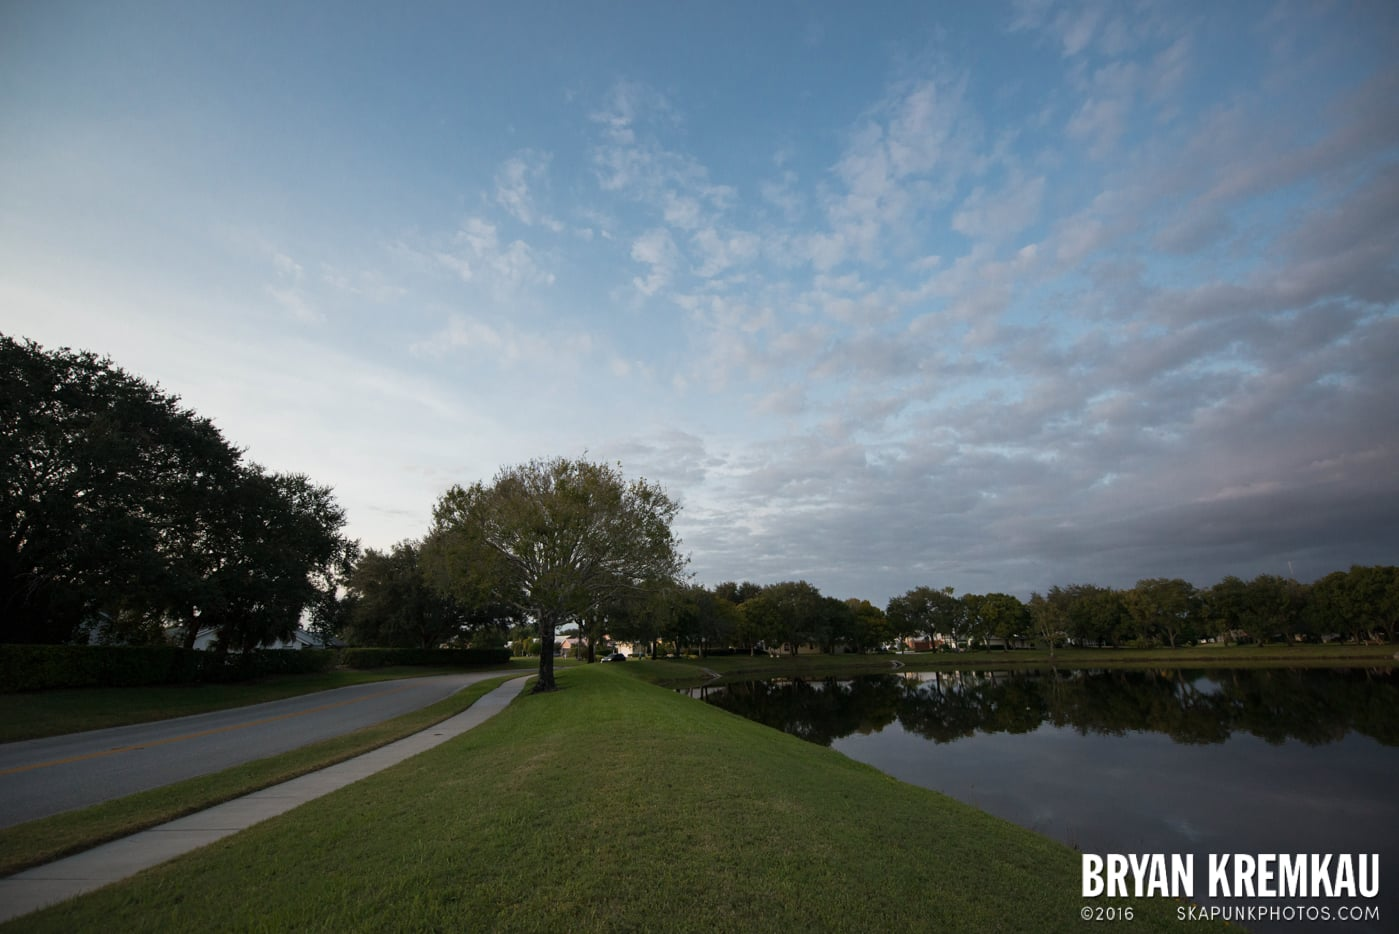 Sunsets, Astrophotography & Birds @ Venice, Florida - 10.25.14 - 11.5.14 (14)